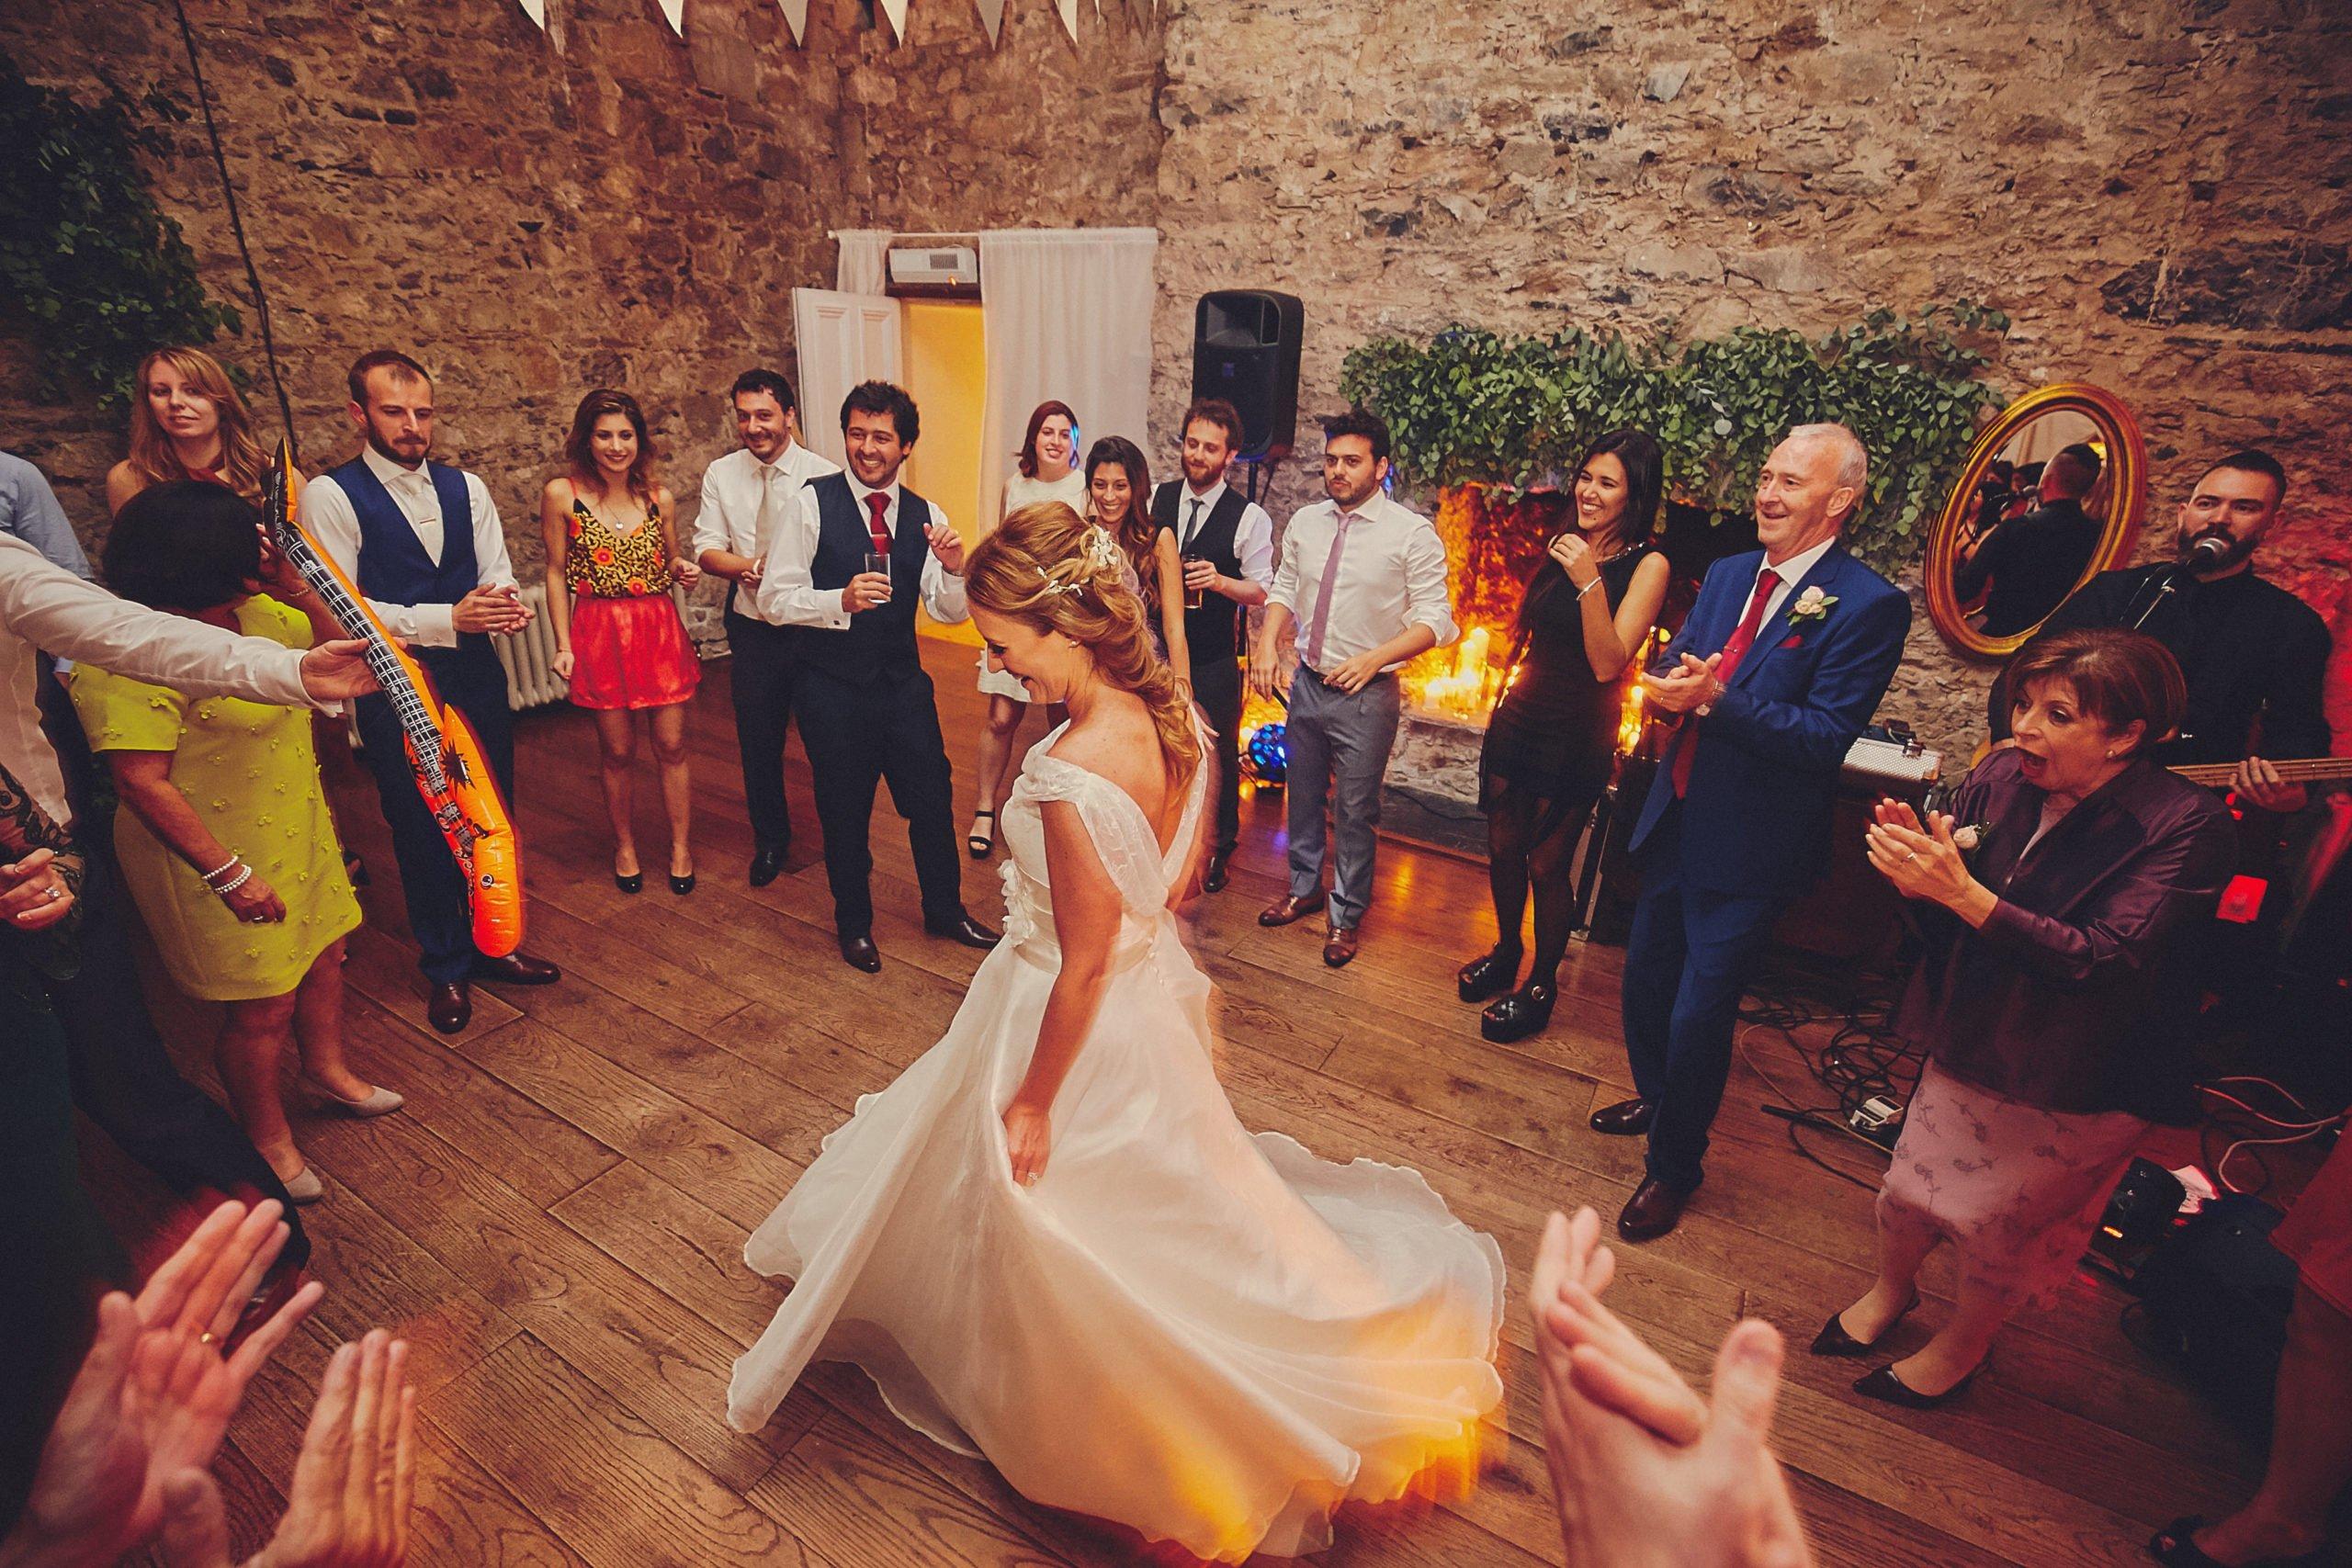 Cloughjordan House Wedding - Alternative Venue 149